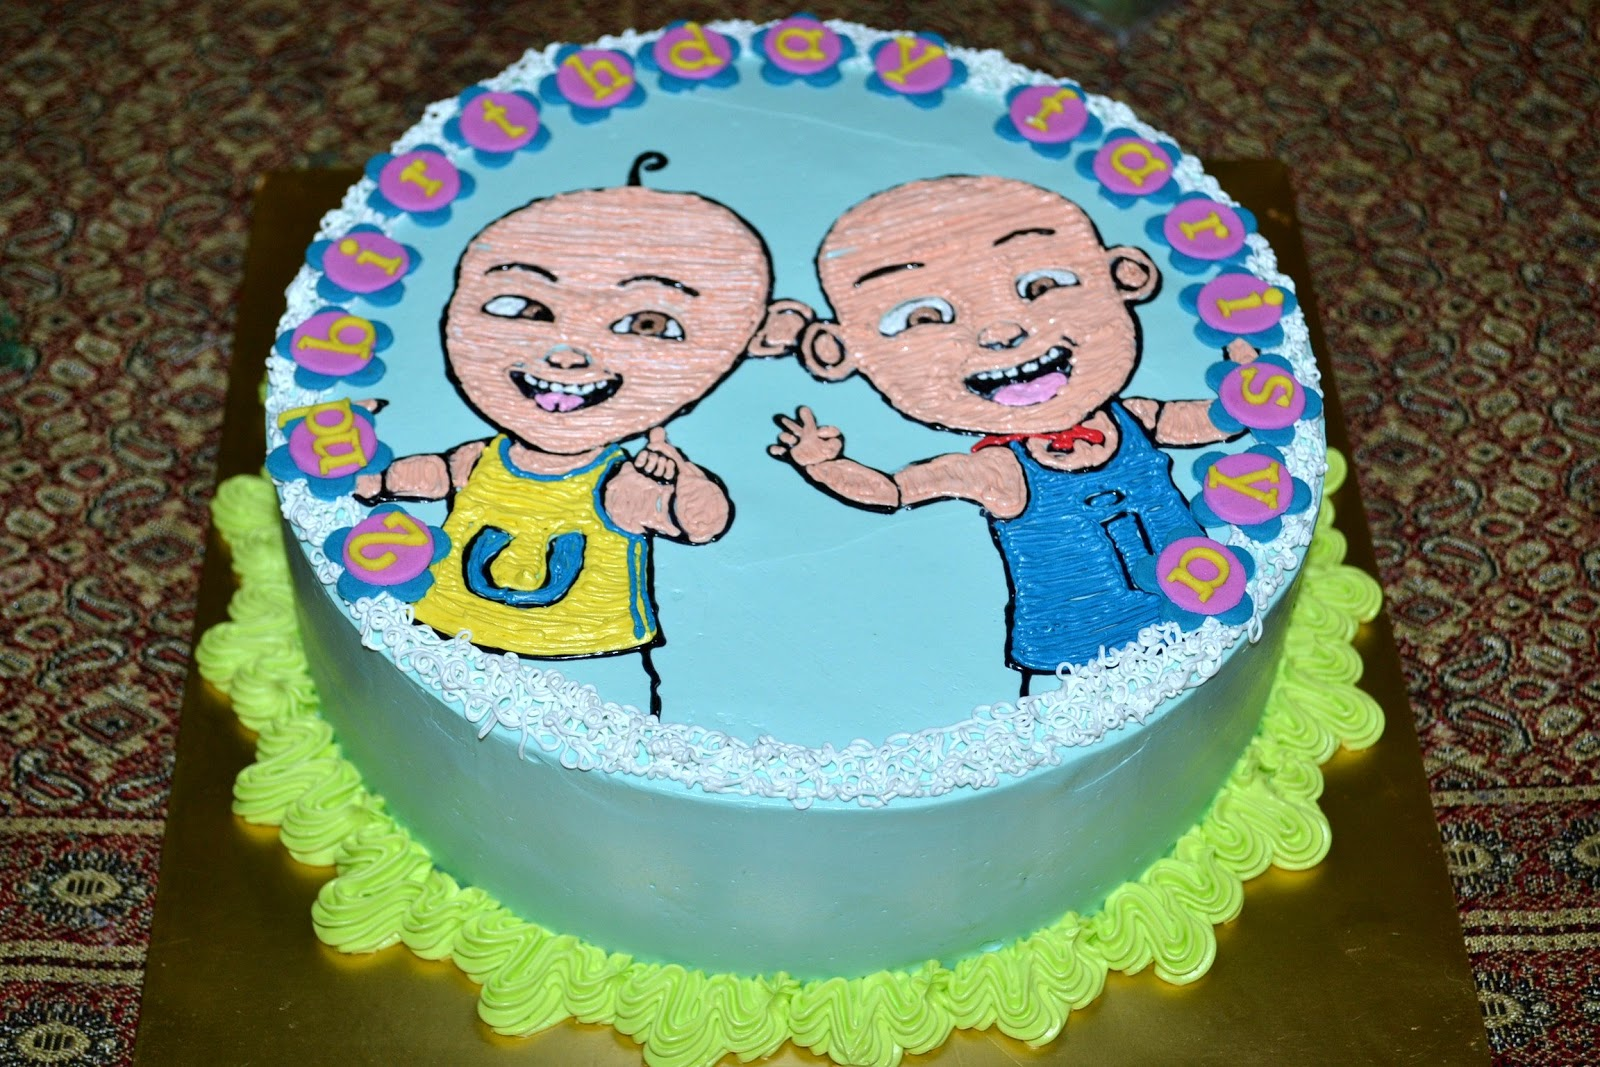 MyPu3 Cake House: Upin Ipin Cake